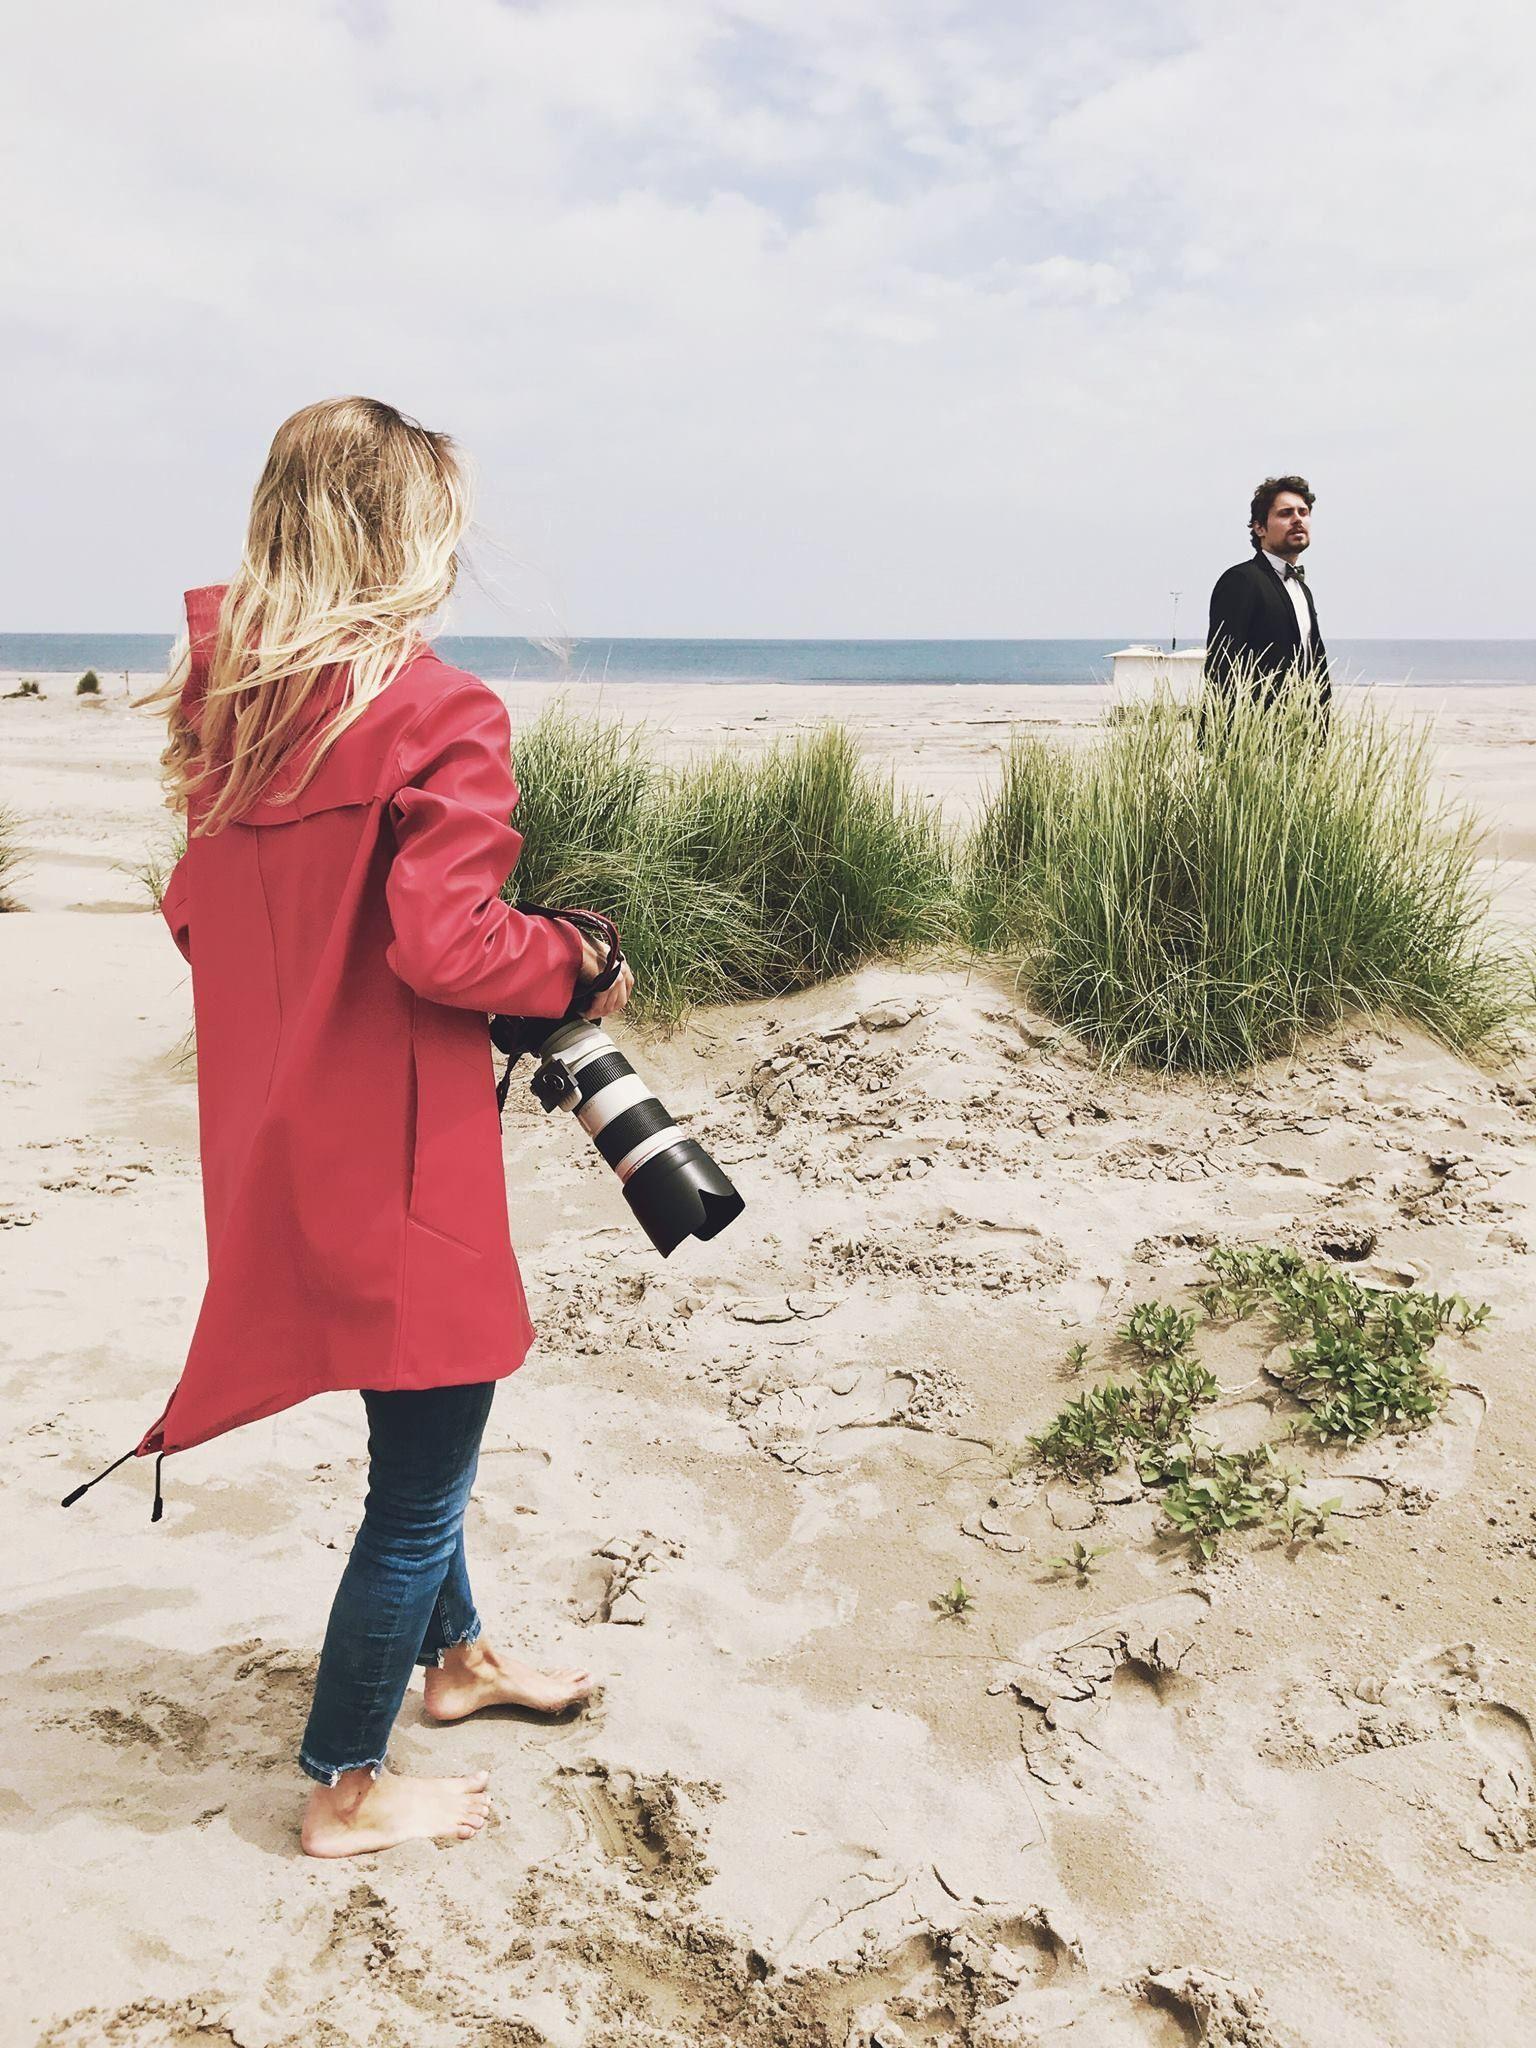 Shooting in progress 📸 #kjøre #kjoreproject #photo #canon #friends #handmade #leather #sea #nature #adventure #new #backpack #sunset 